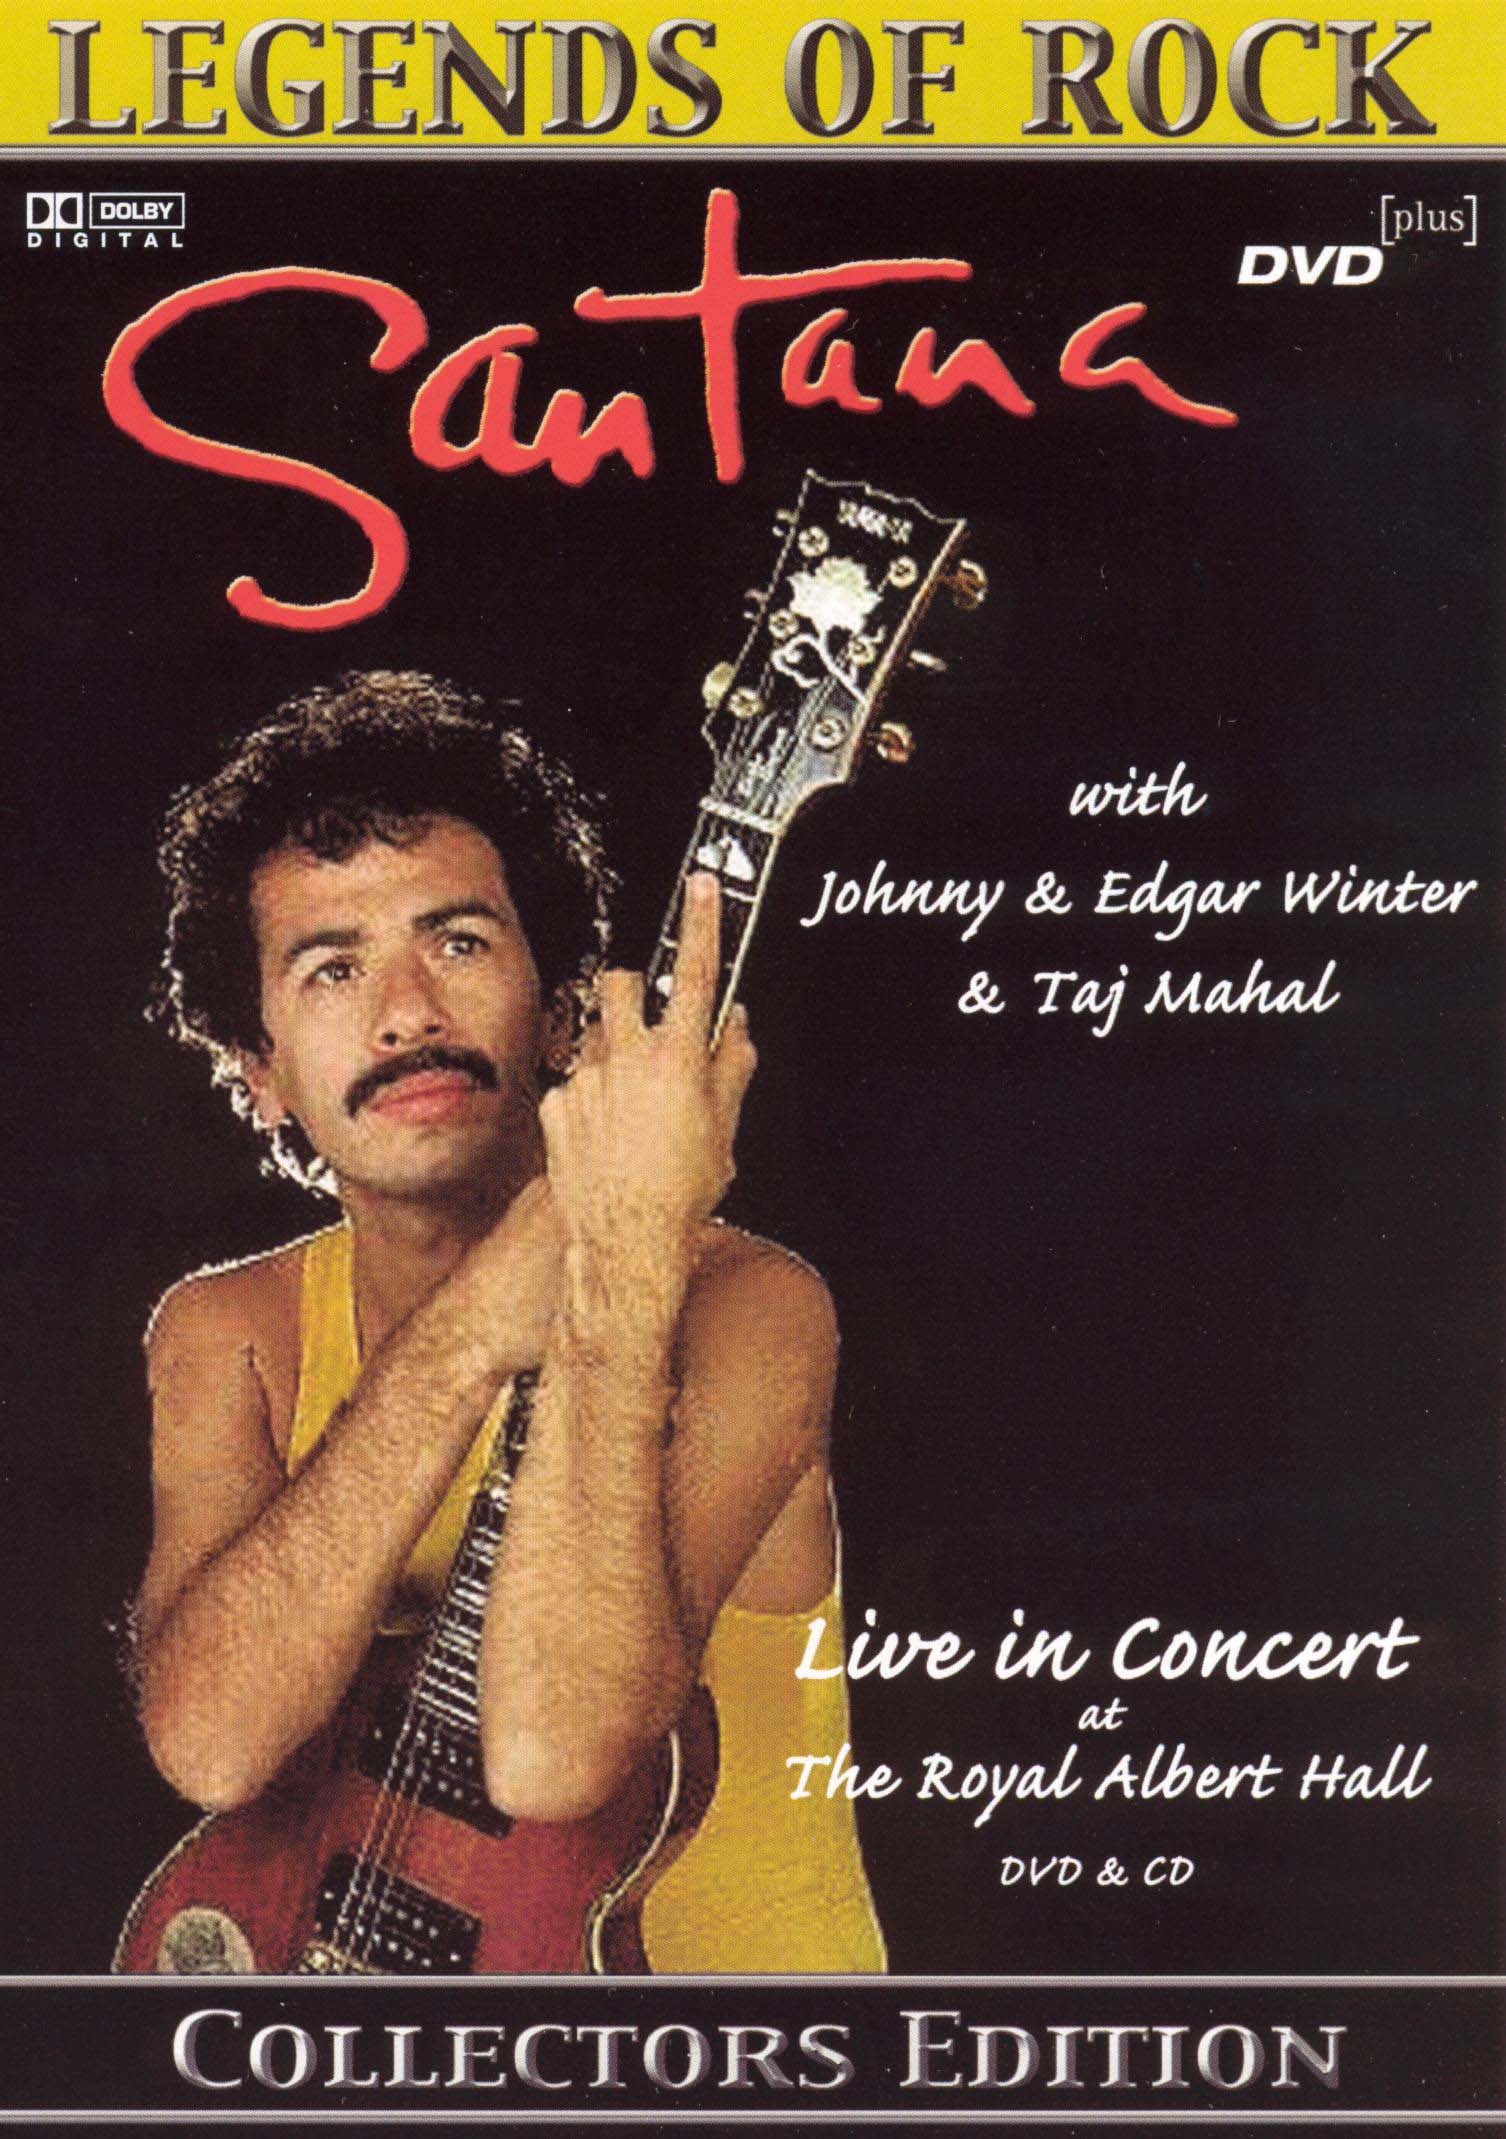 Santana: With Johnny & Edgar Winter & Taj Mahal: Live in Concert at The Royal Albert Theater